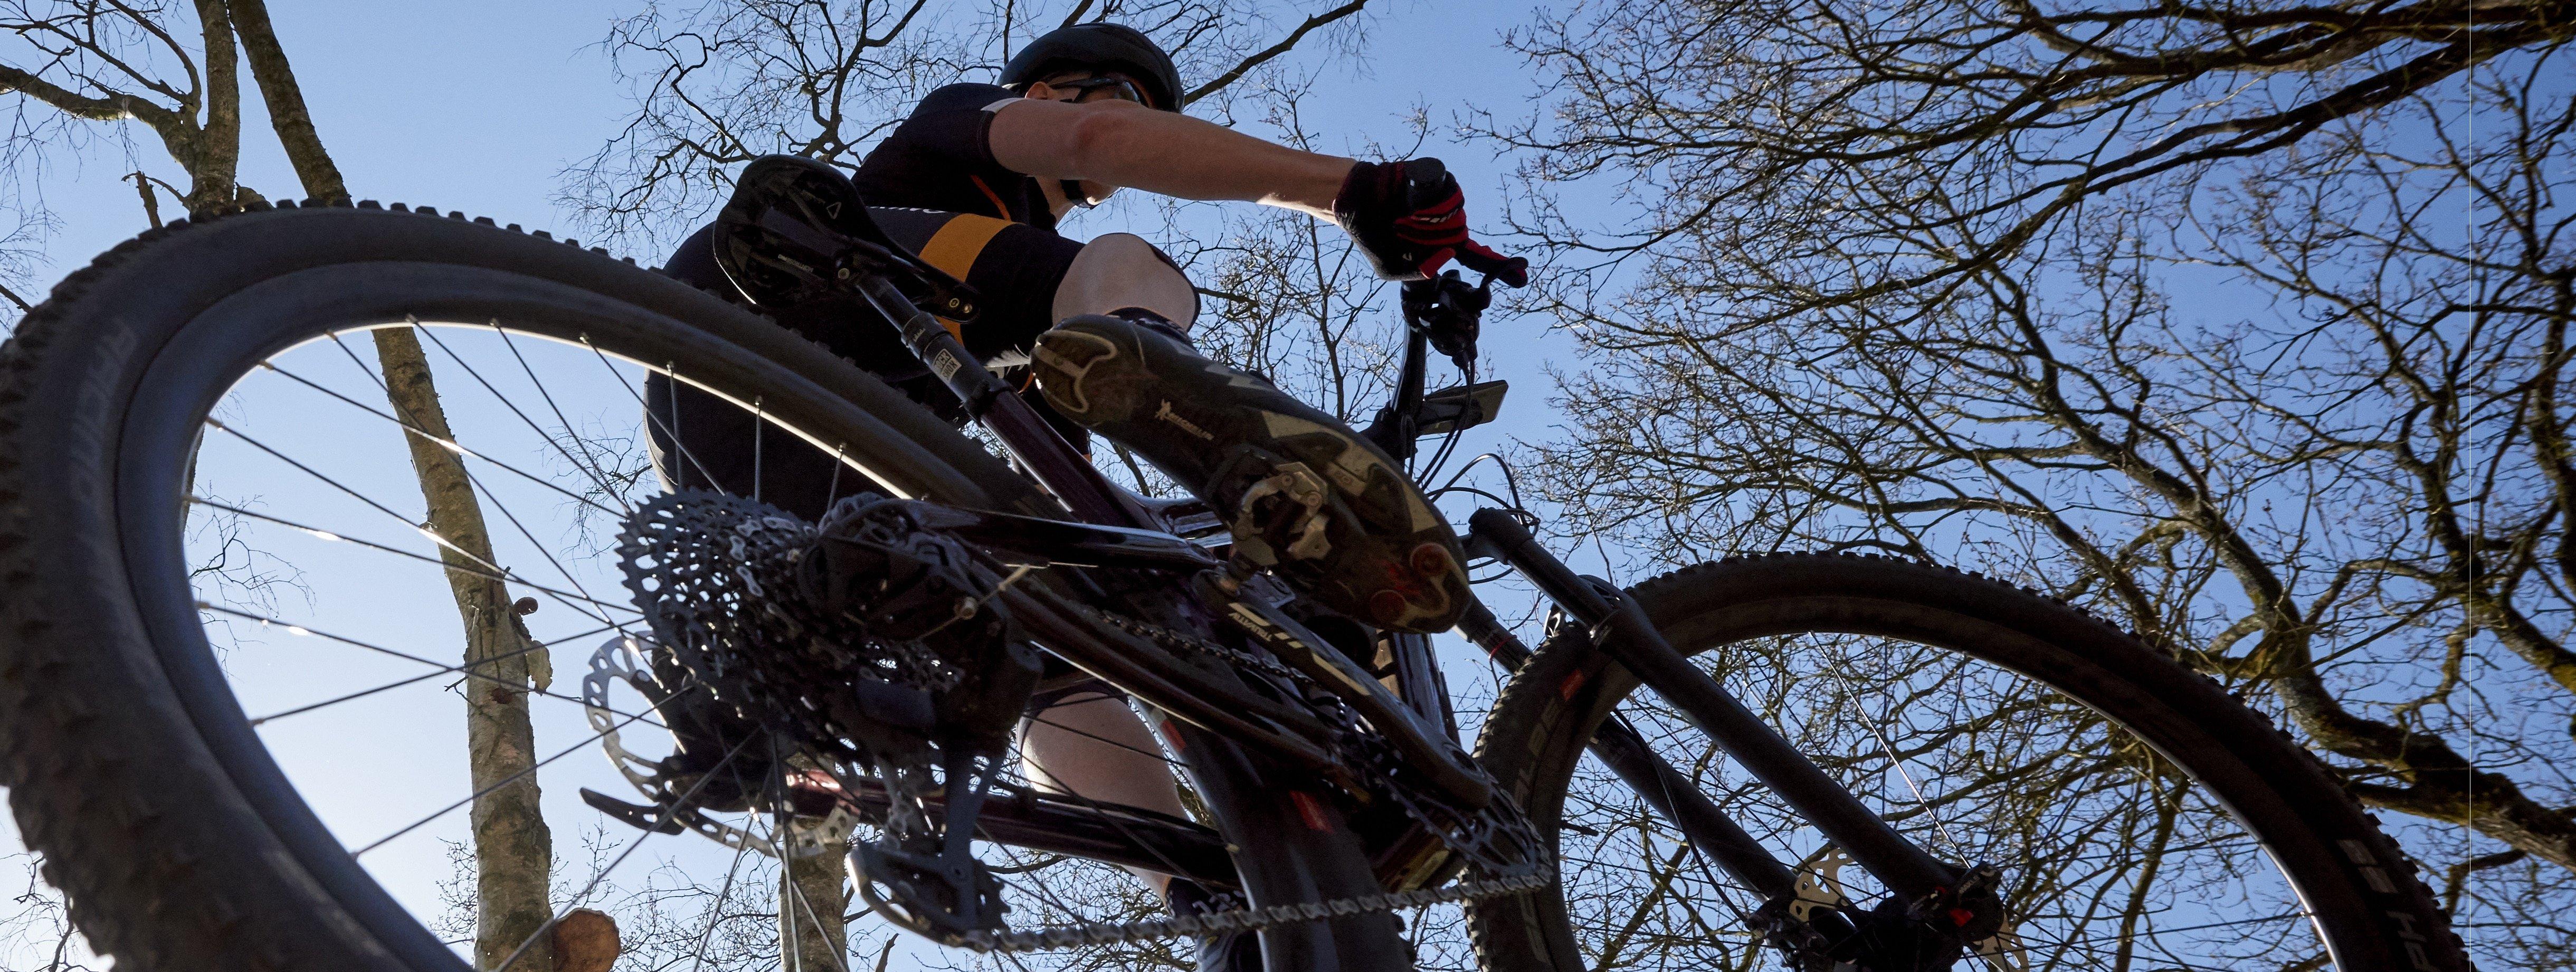 Alles over pedalen en toebehoren